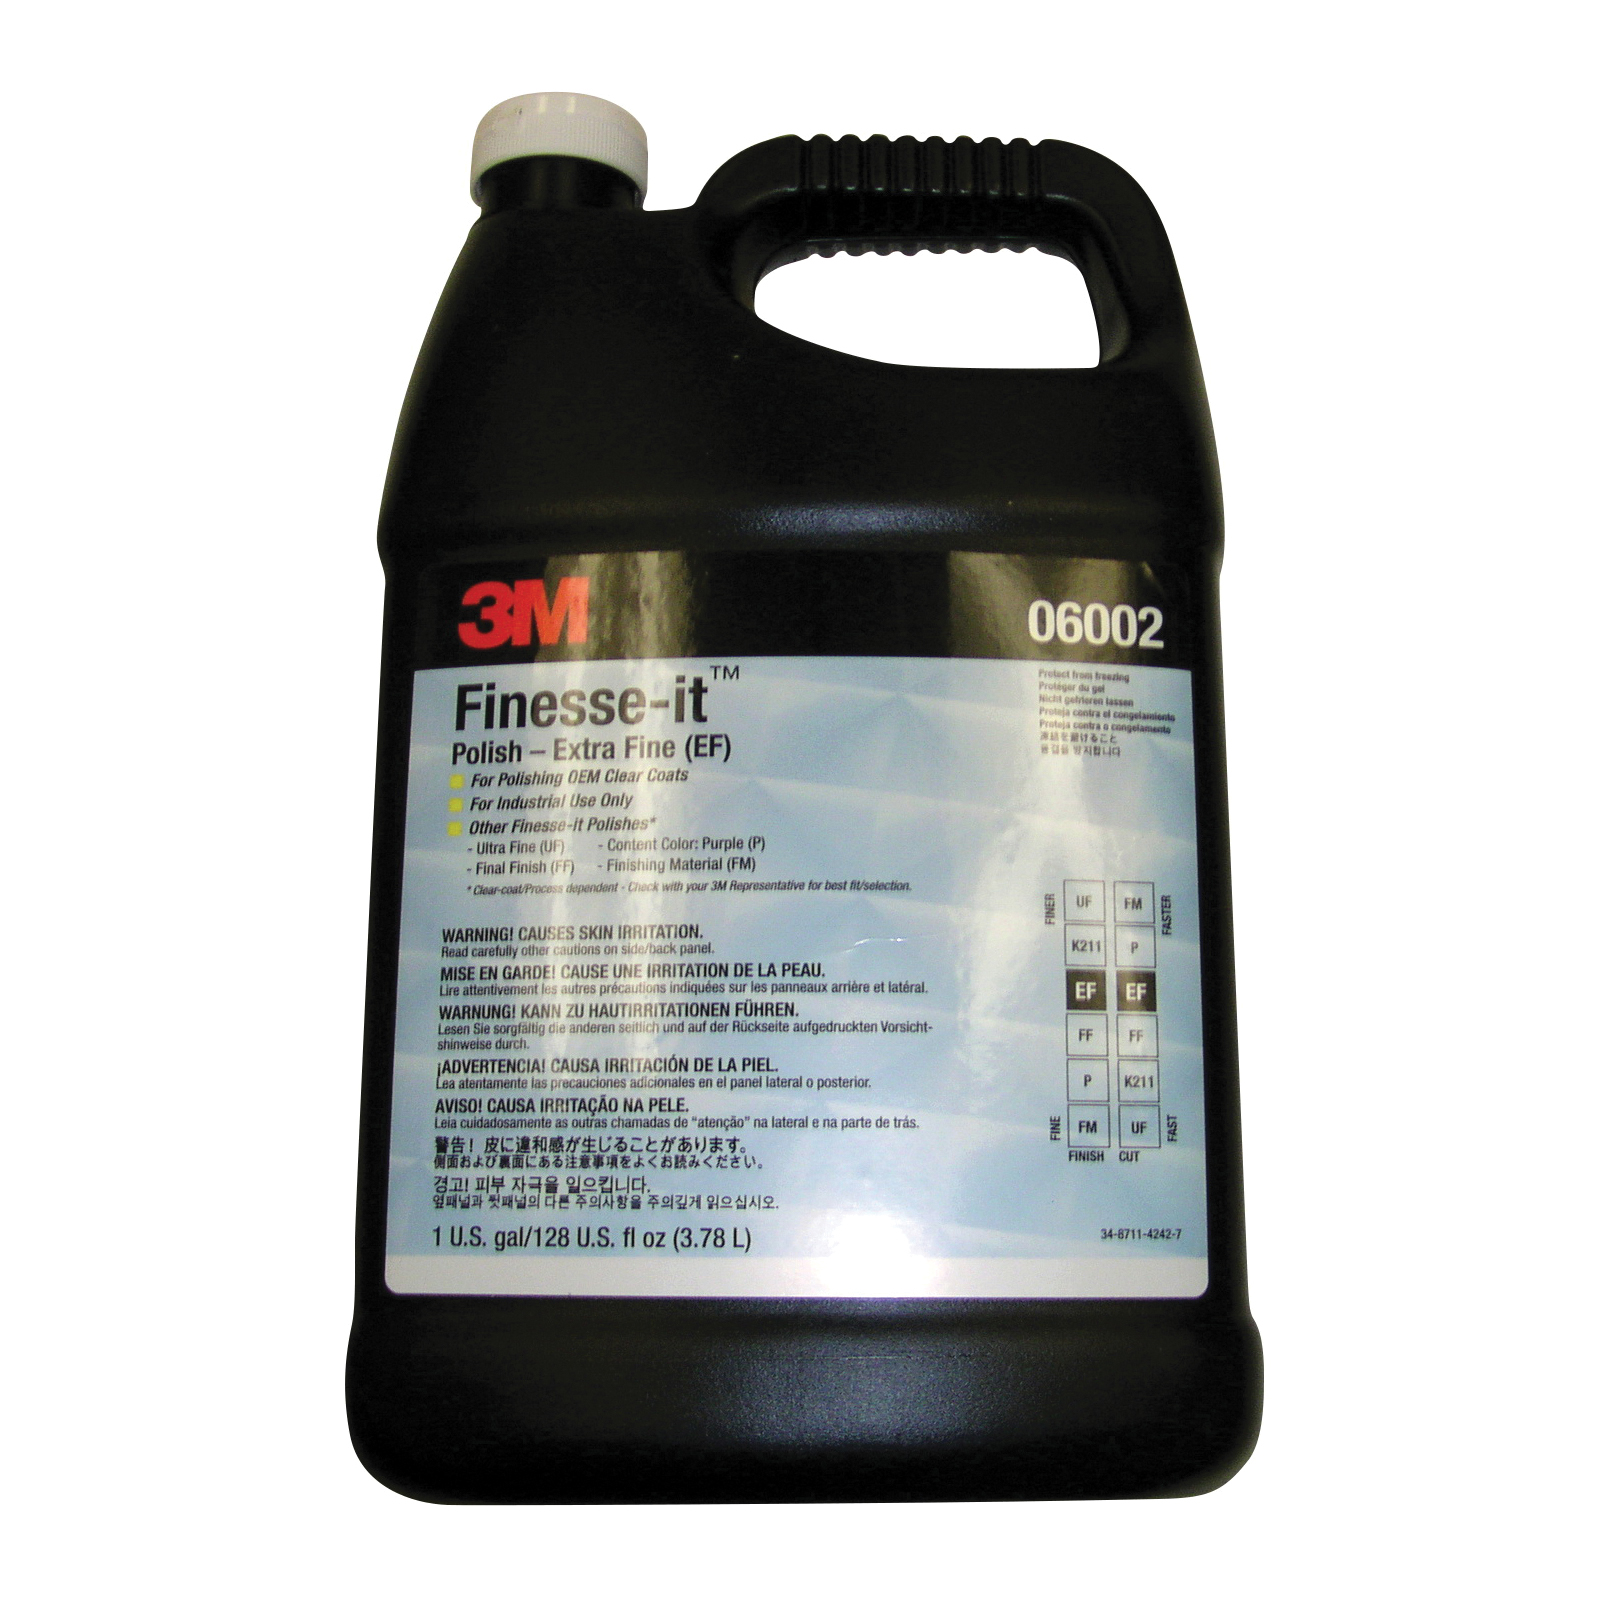 3M™ Finesse-it™ 051131-06002 Extra Fine Polishing Compound, 1 gal Bottle, White, Extra Fine Grade